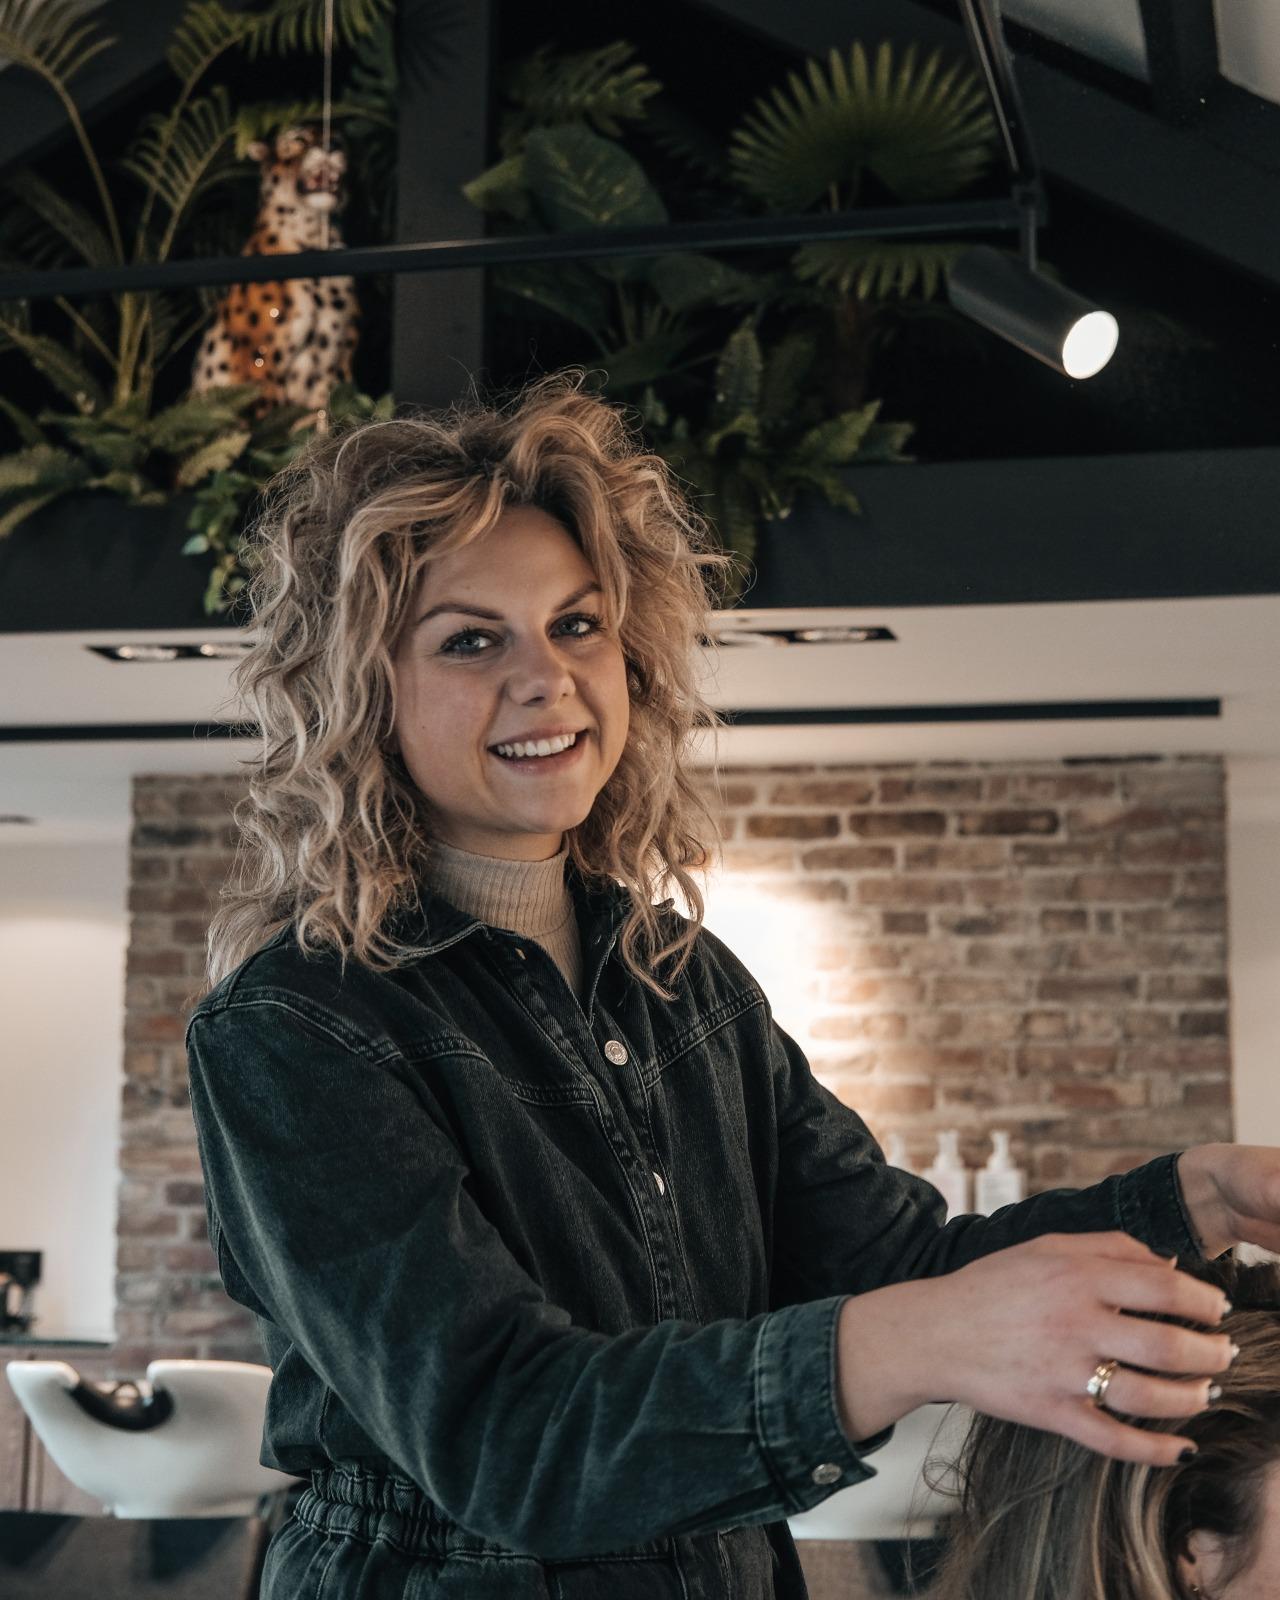 Steffie - Kapper bij Good to be hair Budel